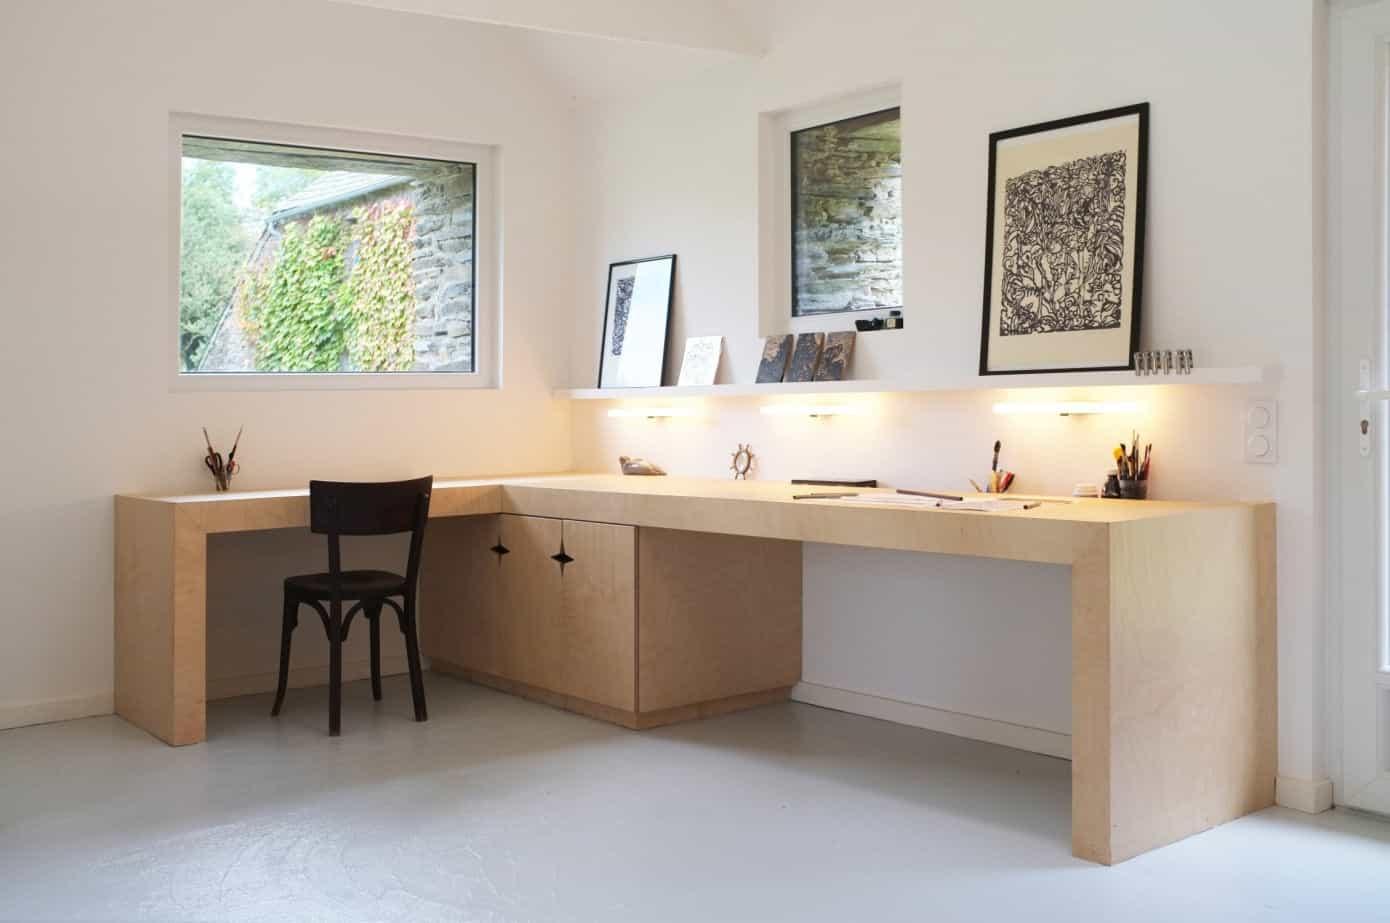 designrulz artist-studio-modal-architecture (17)